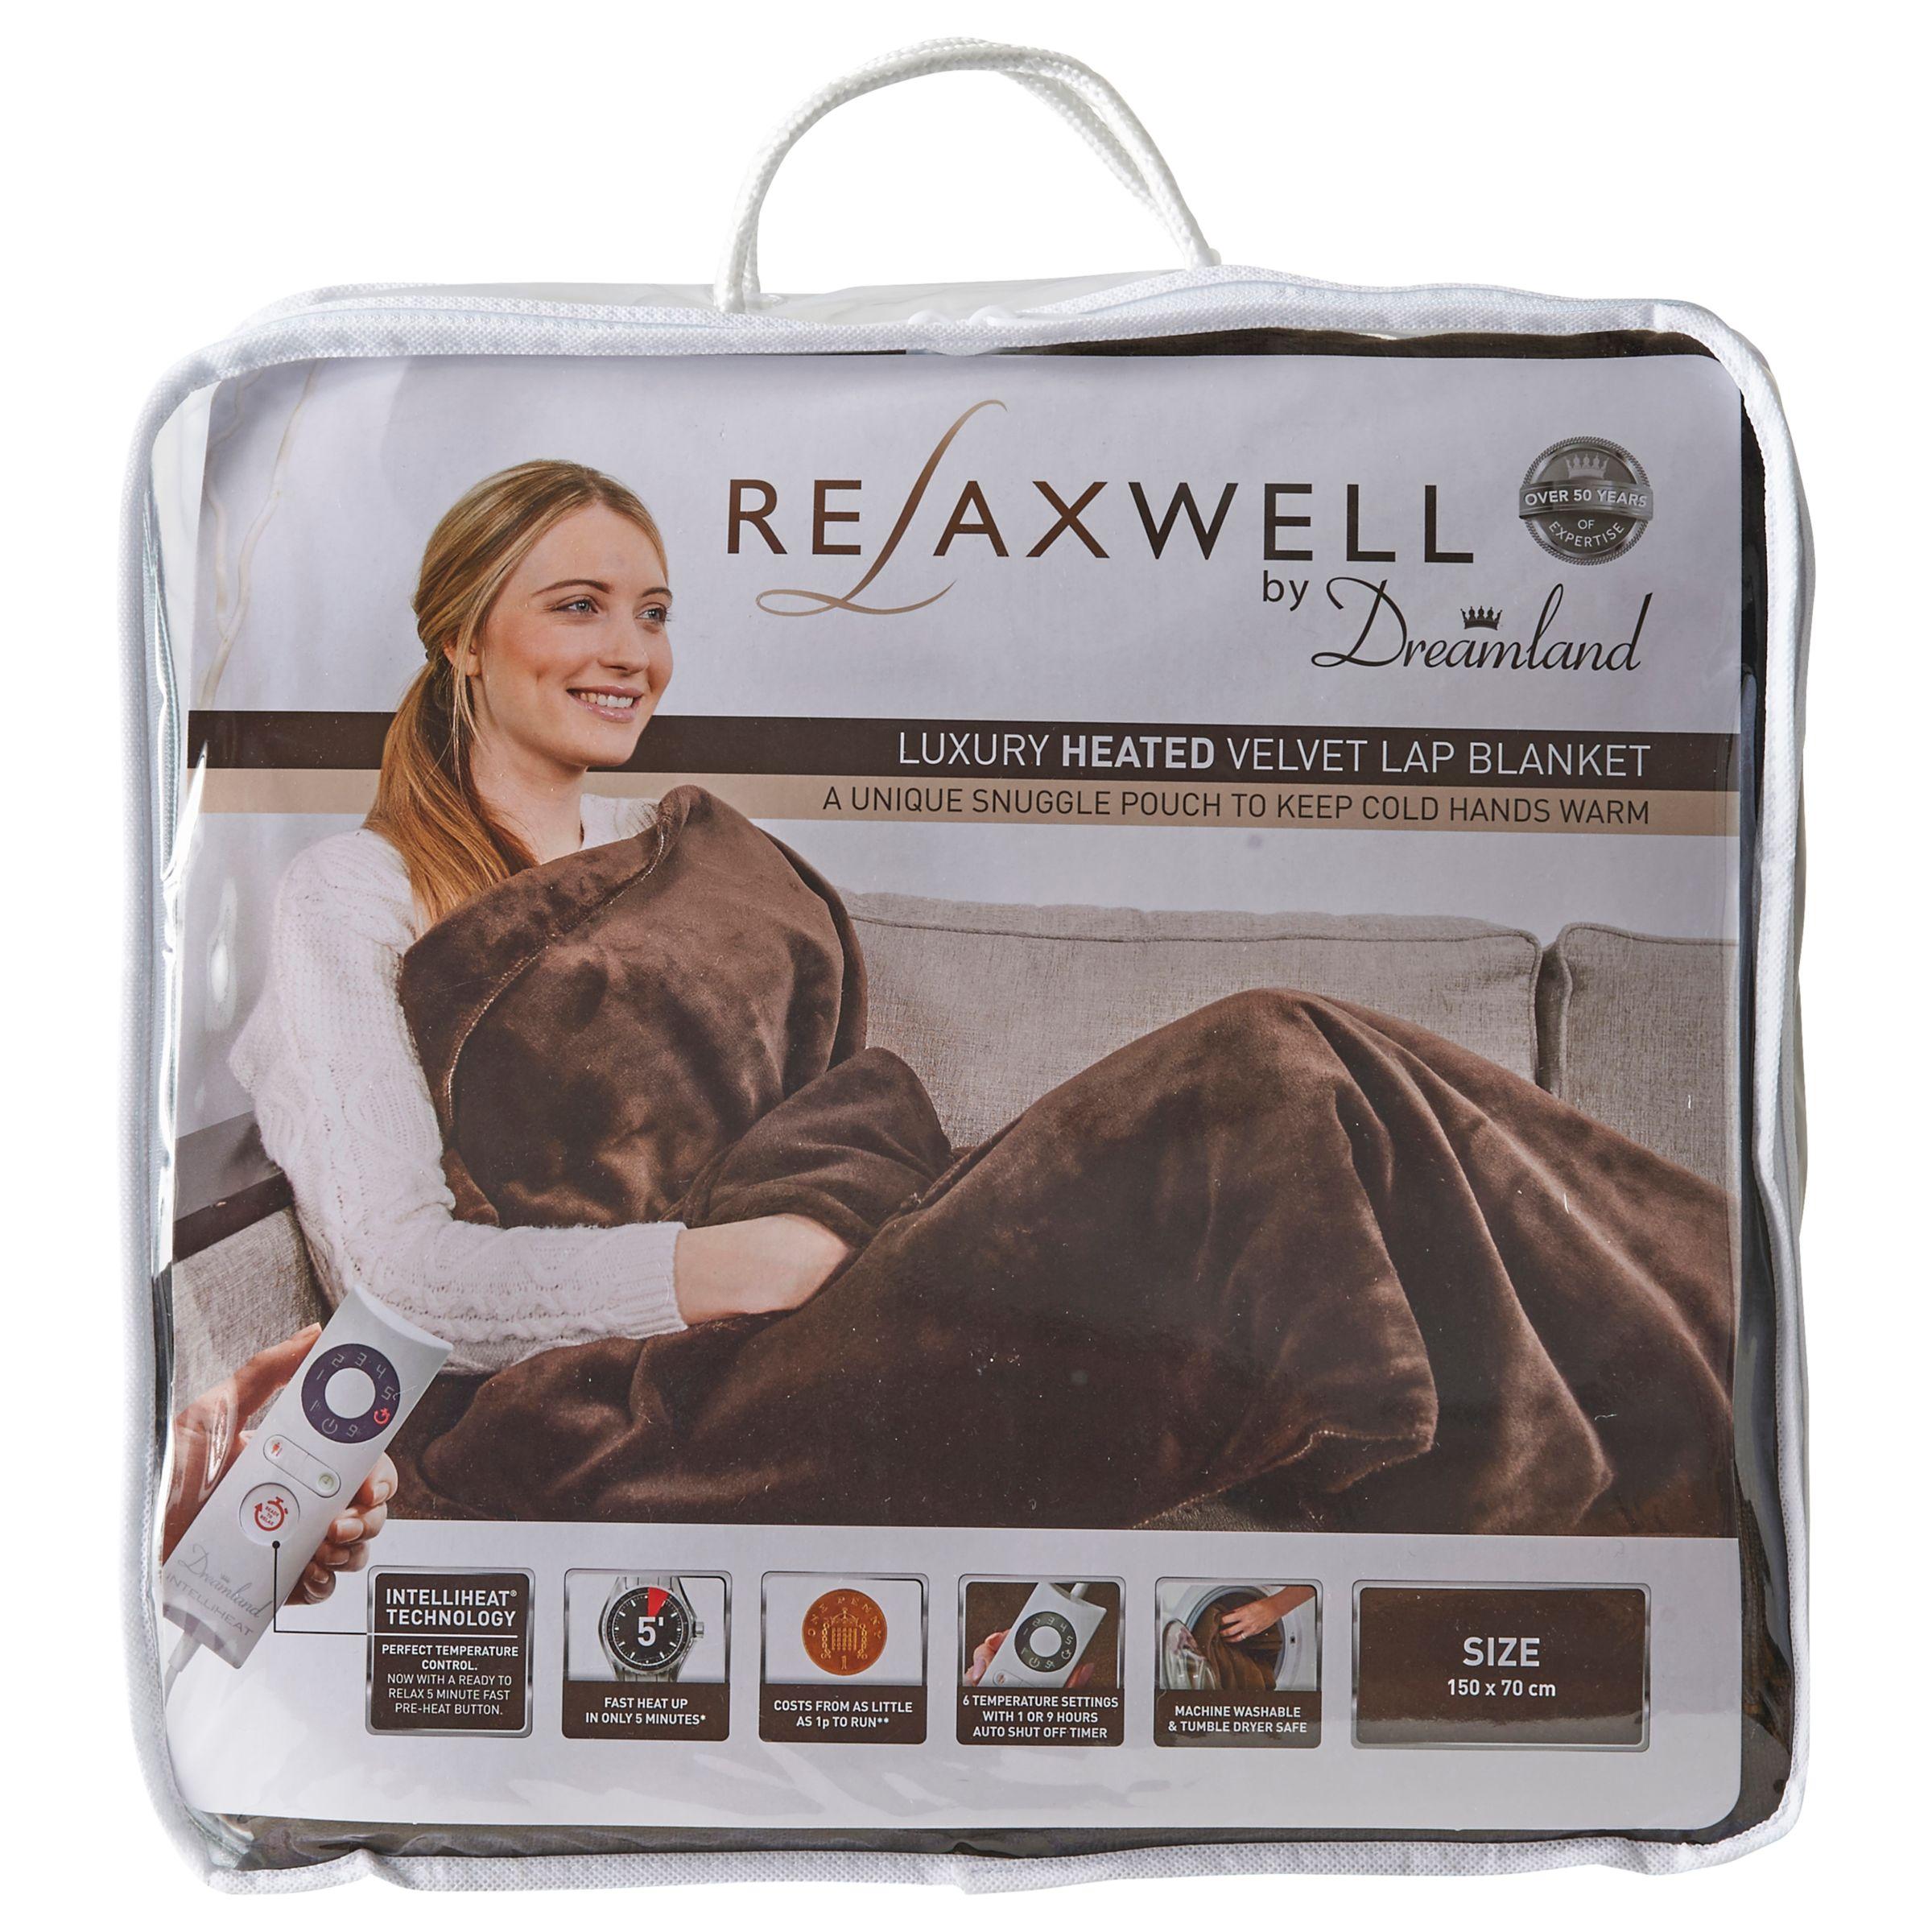 Dreamland 16335 Relaxwell Luxury Heated Velvet Lap Blanket At John Lewis Partners